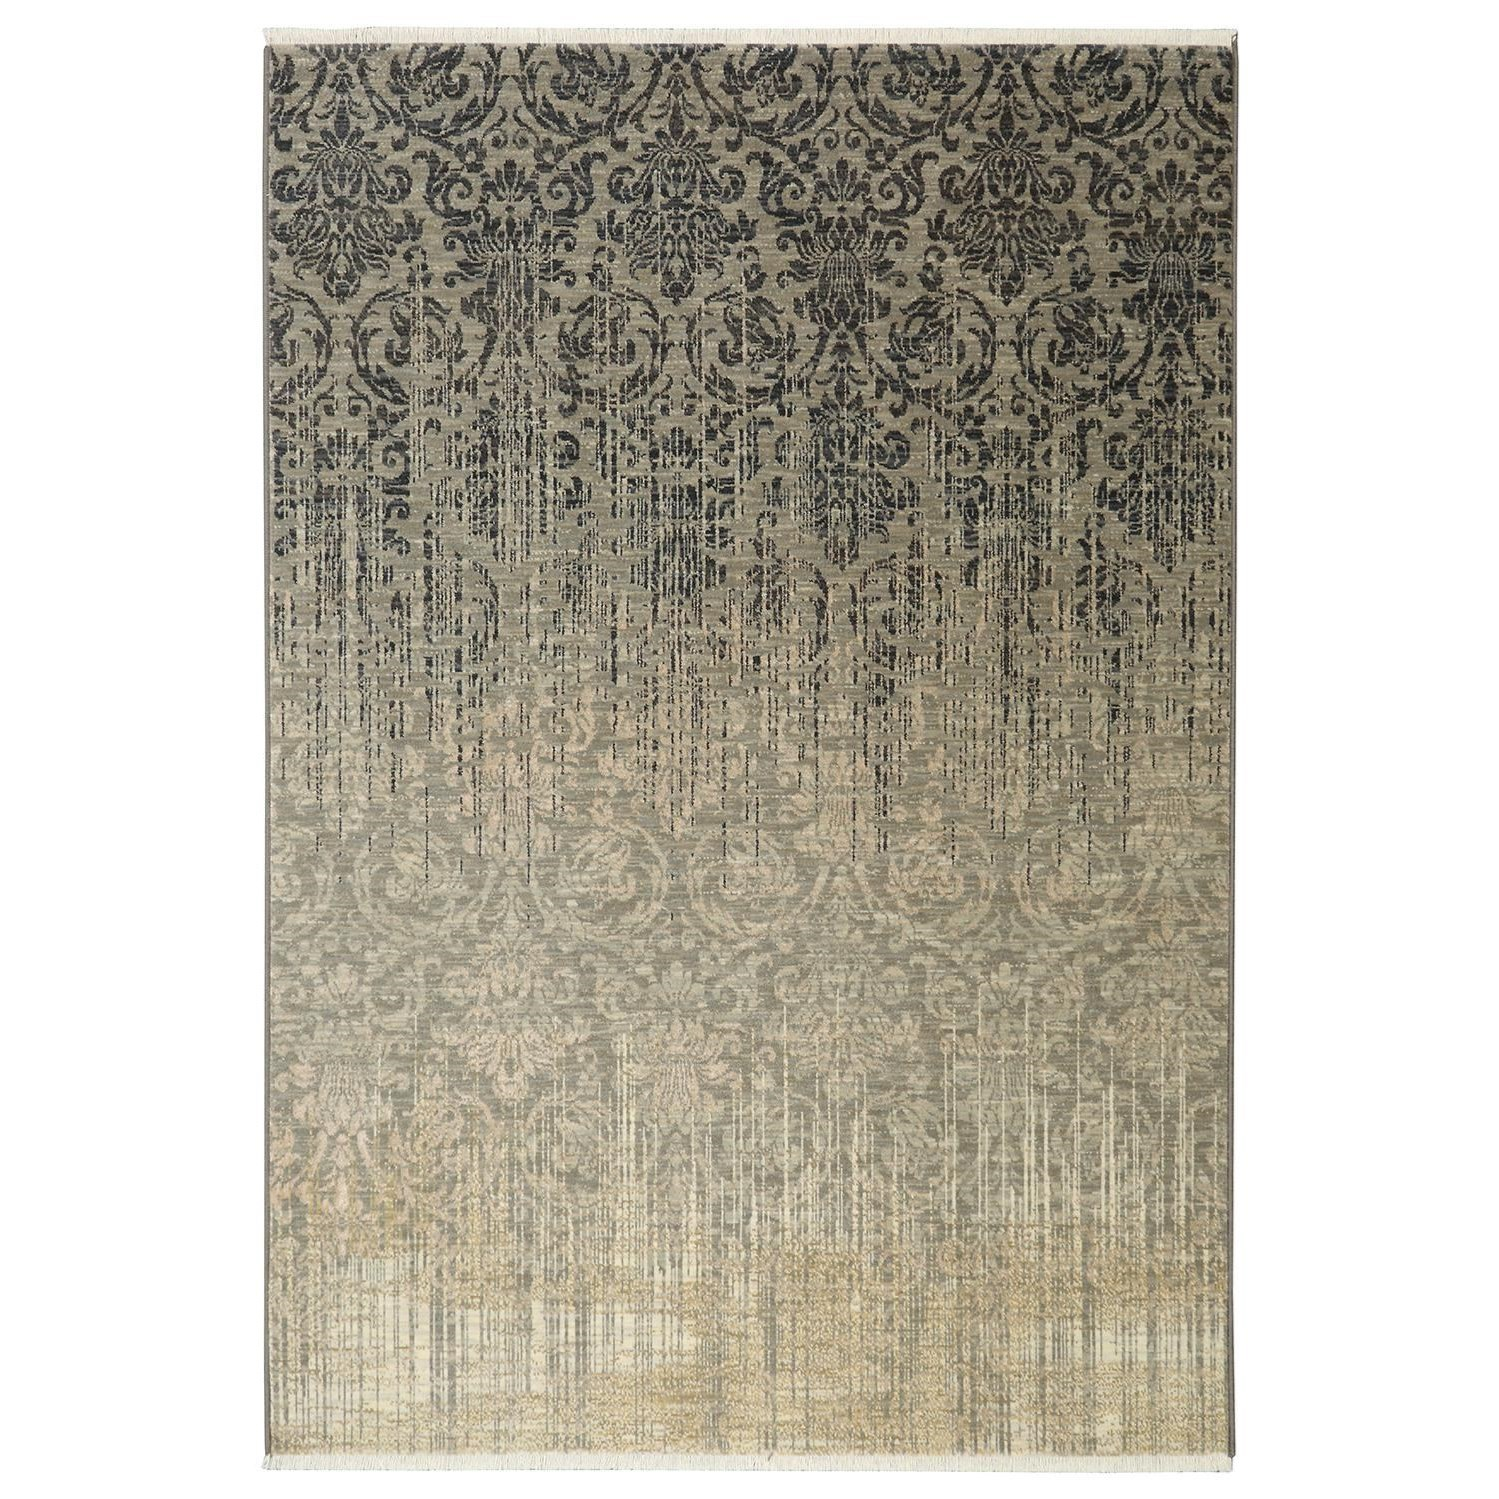 Karastan Rugs Titanium 9'4x12'9 Tiberio Gray Rug - Item Number: 39400 16009 112153